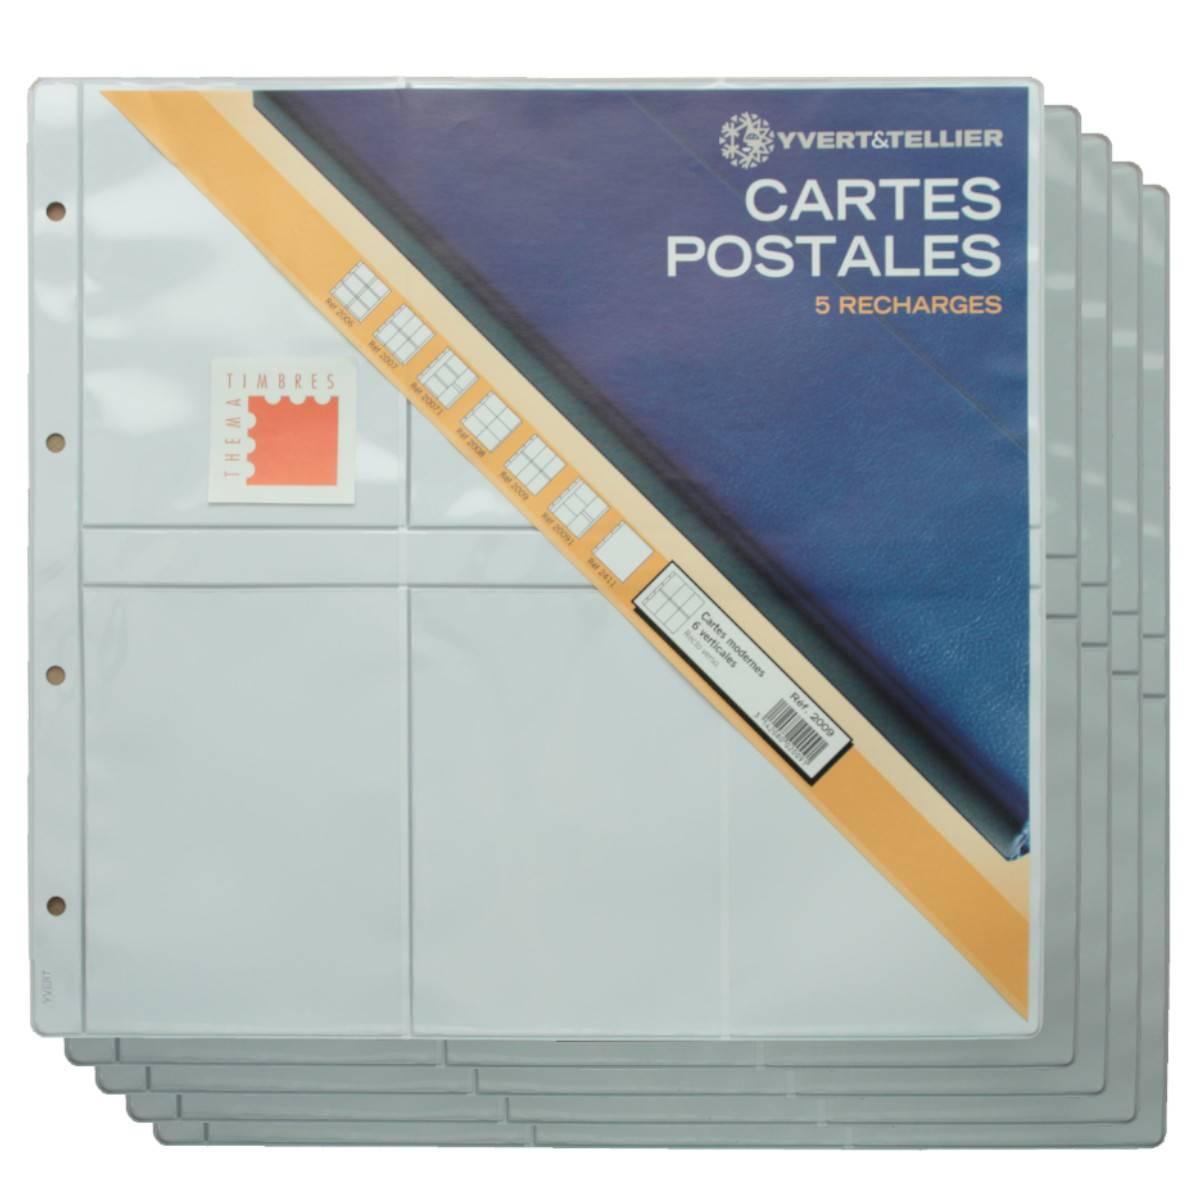 Album Luxe garni pour Cartes Postales Modernes Noir Yvert 20054